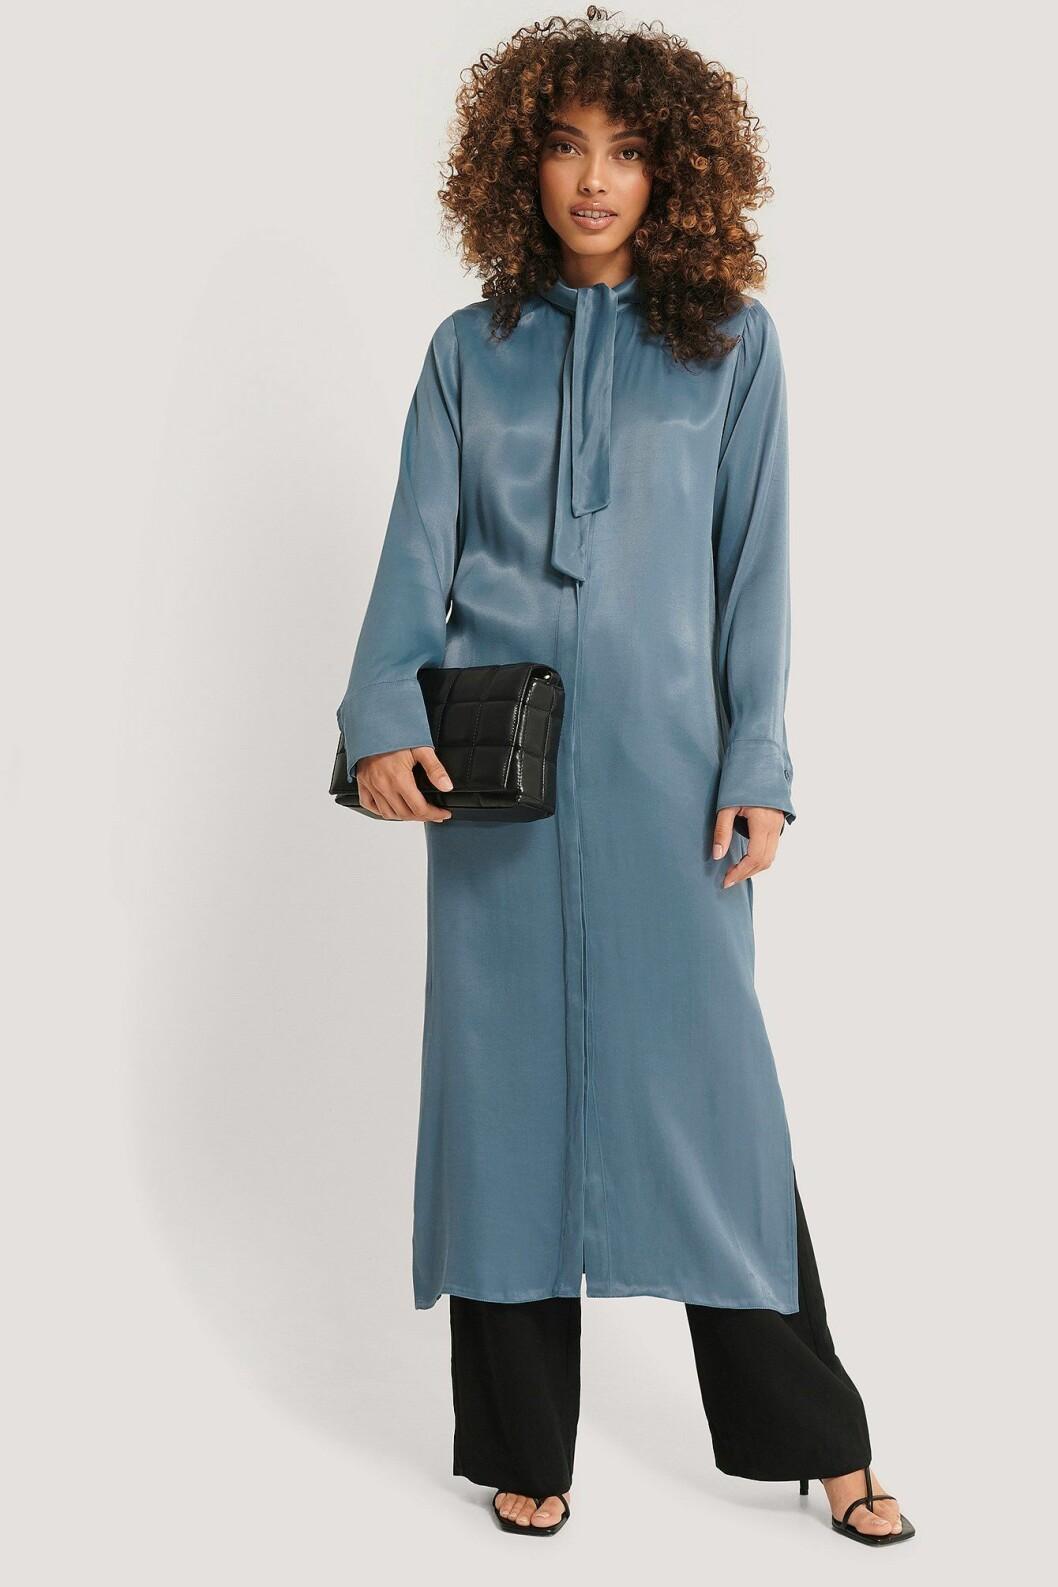 Imane Asry x Na-kd: Blå klänning